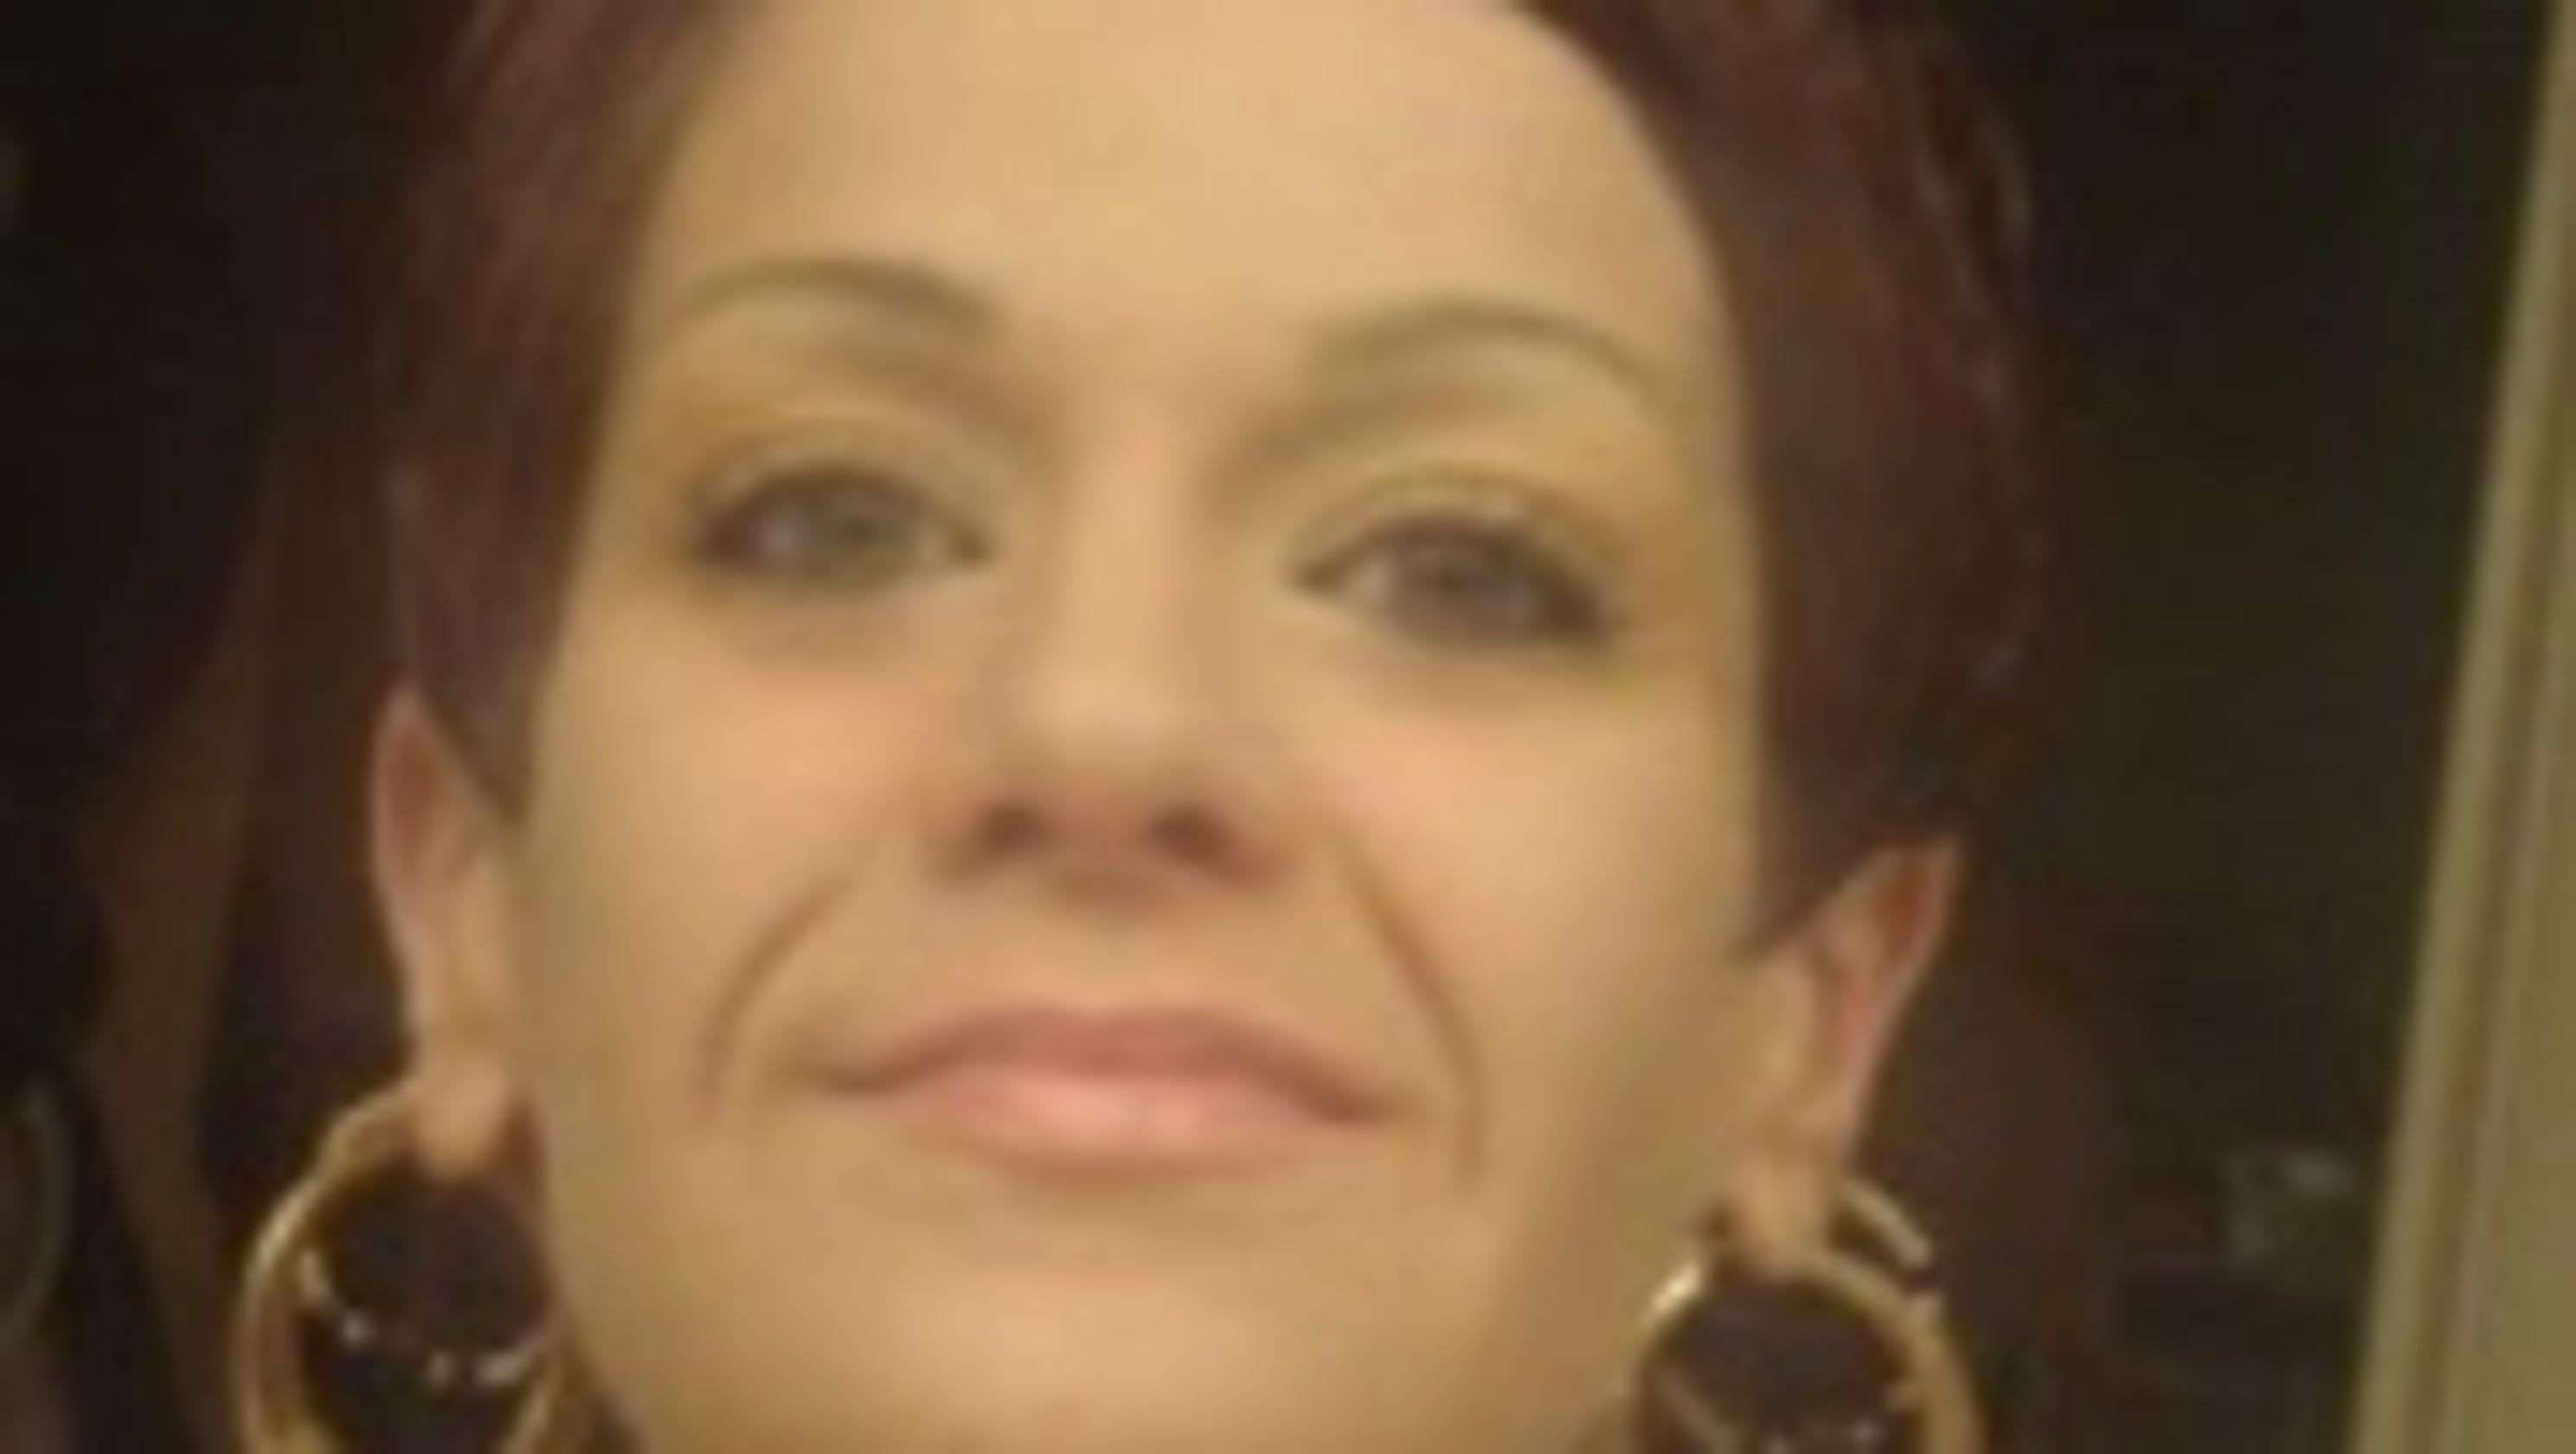 Cellmate recounts last hours of woman's life in Delaware prison